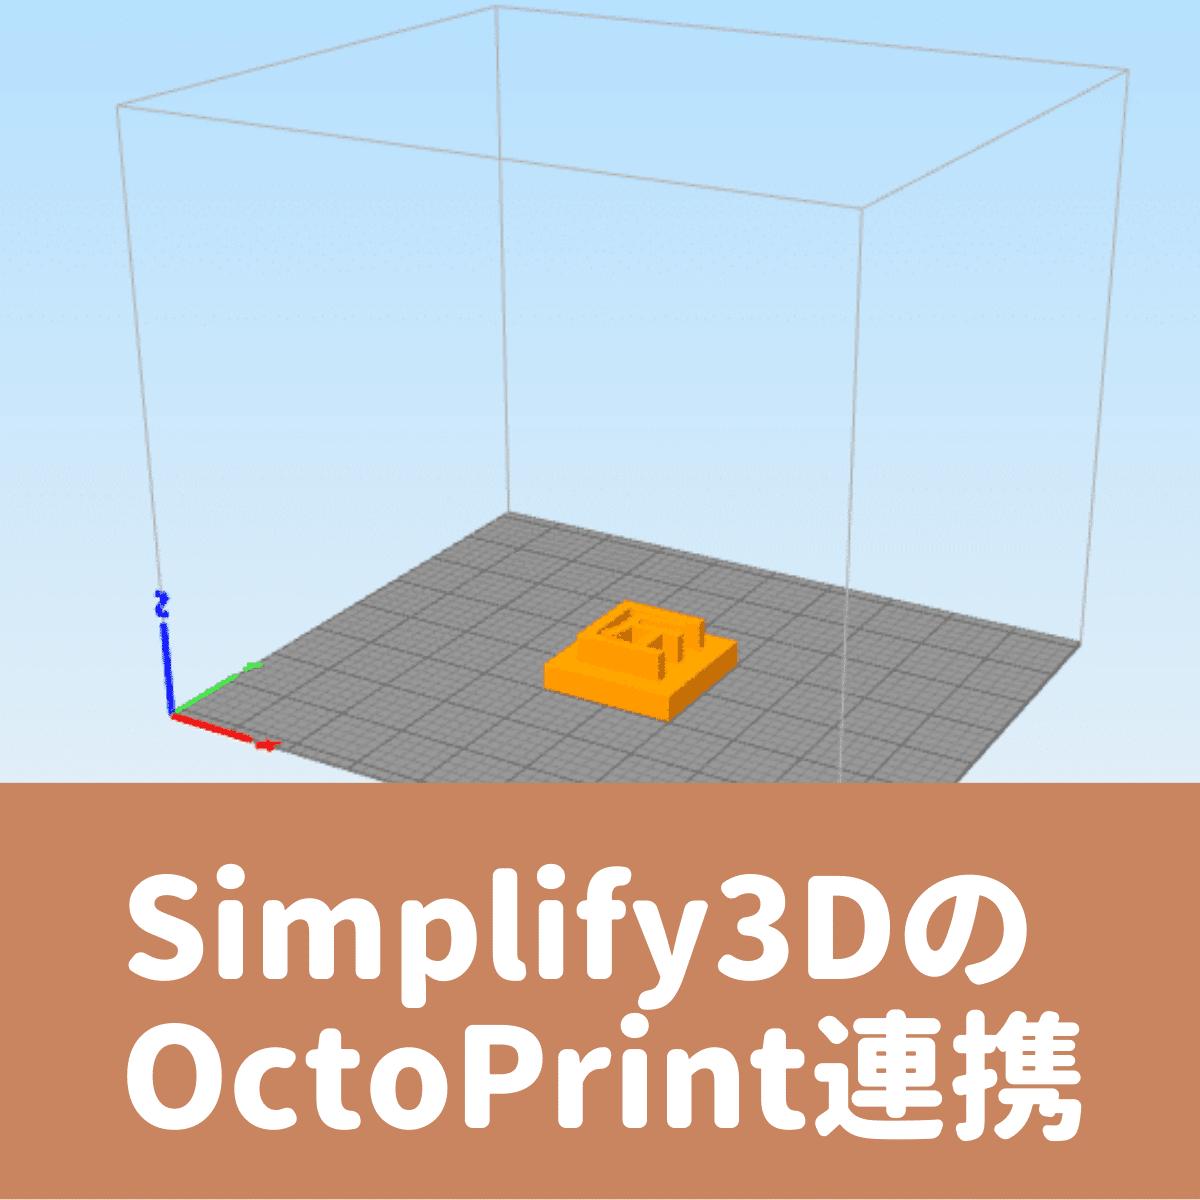 Simplify3DとOctoPrint連携 サムネイル